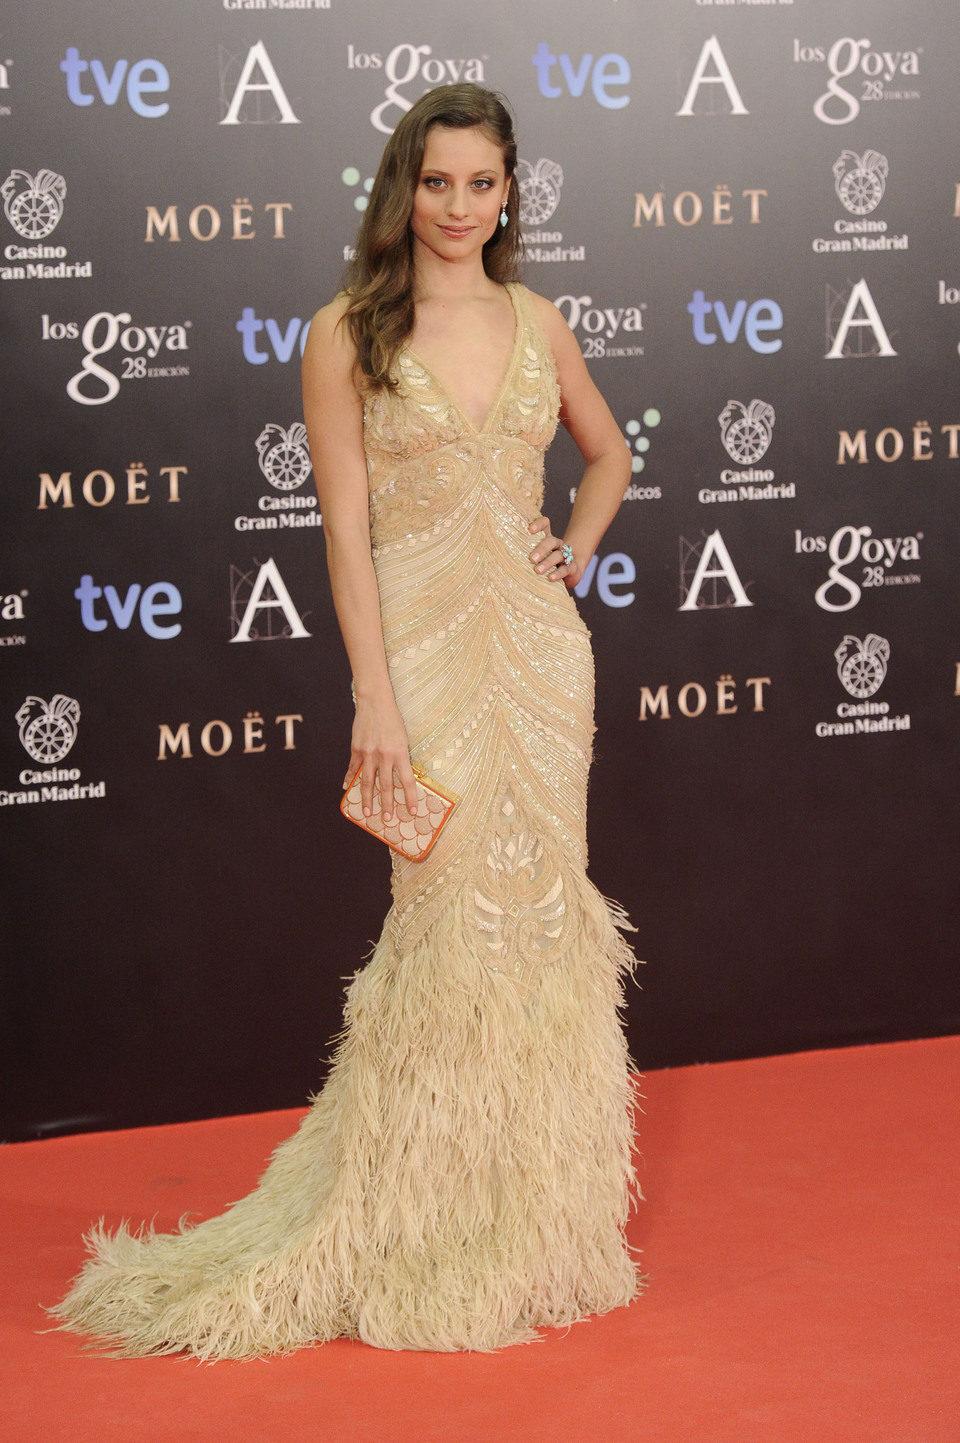 Michelle Jenner en la alfombra roja de los Goya 2014